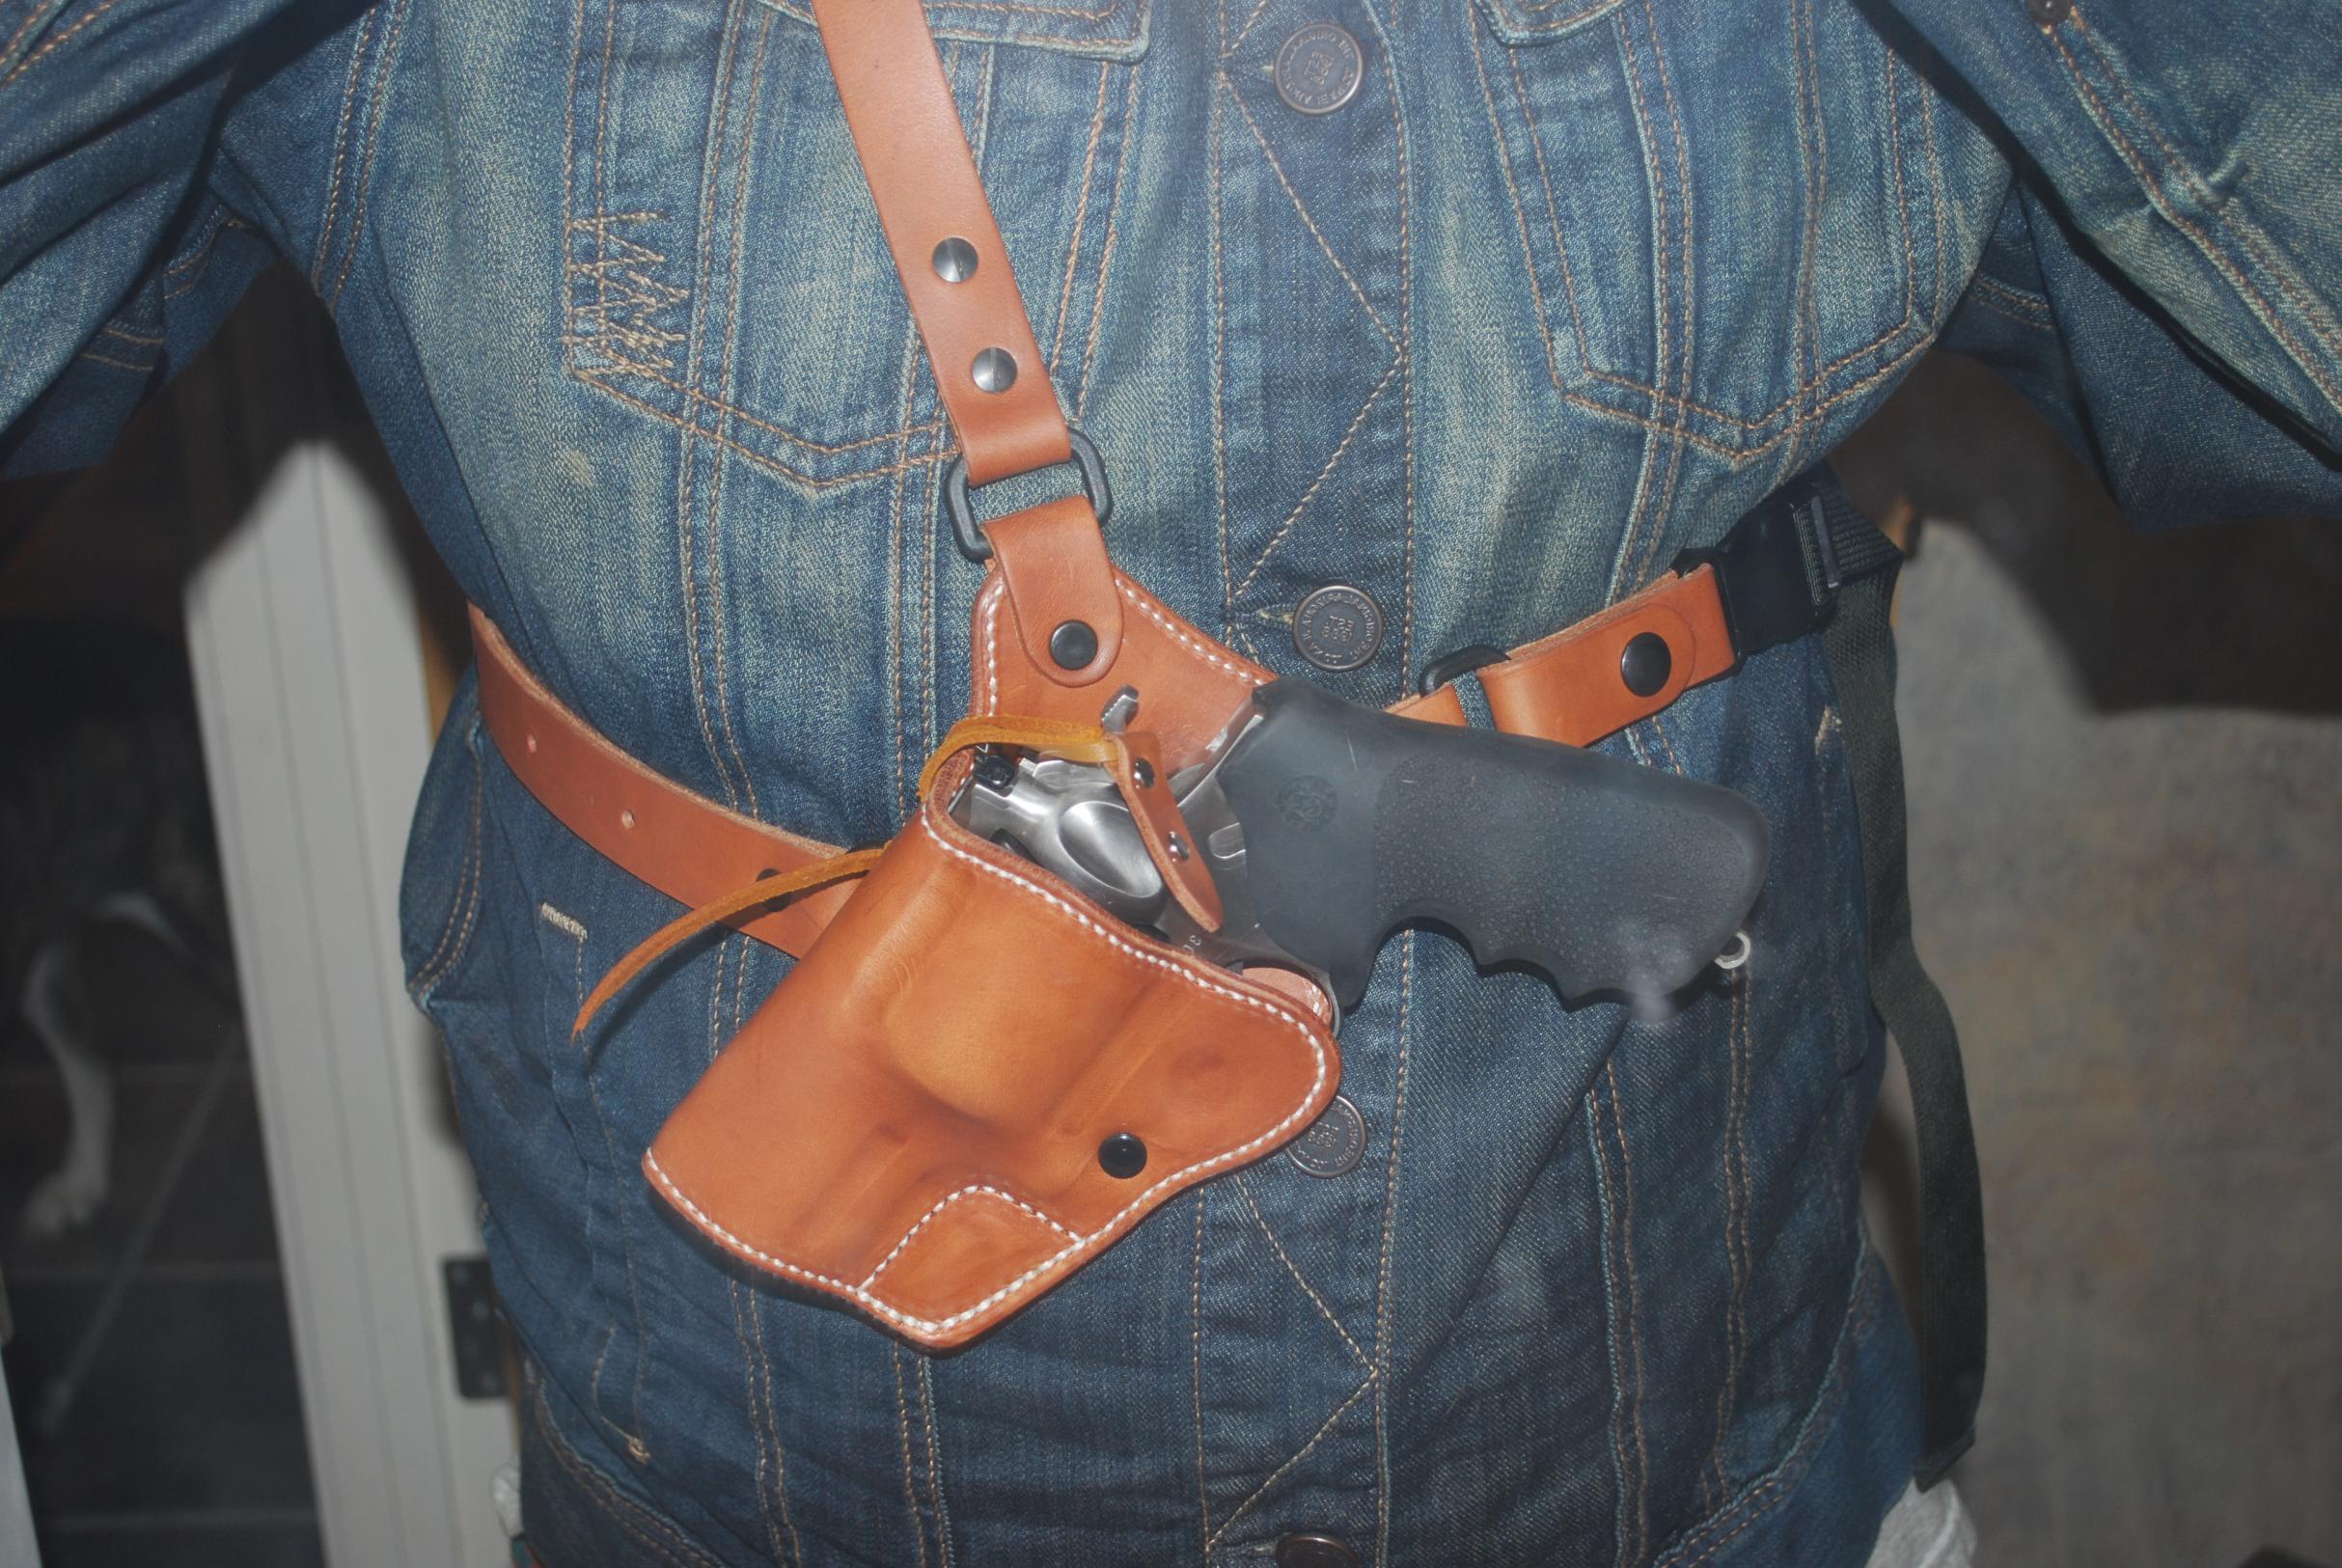 Diamond D Custom Leather-dsc_0001.jpg